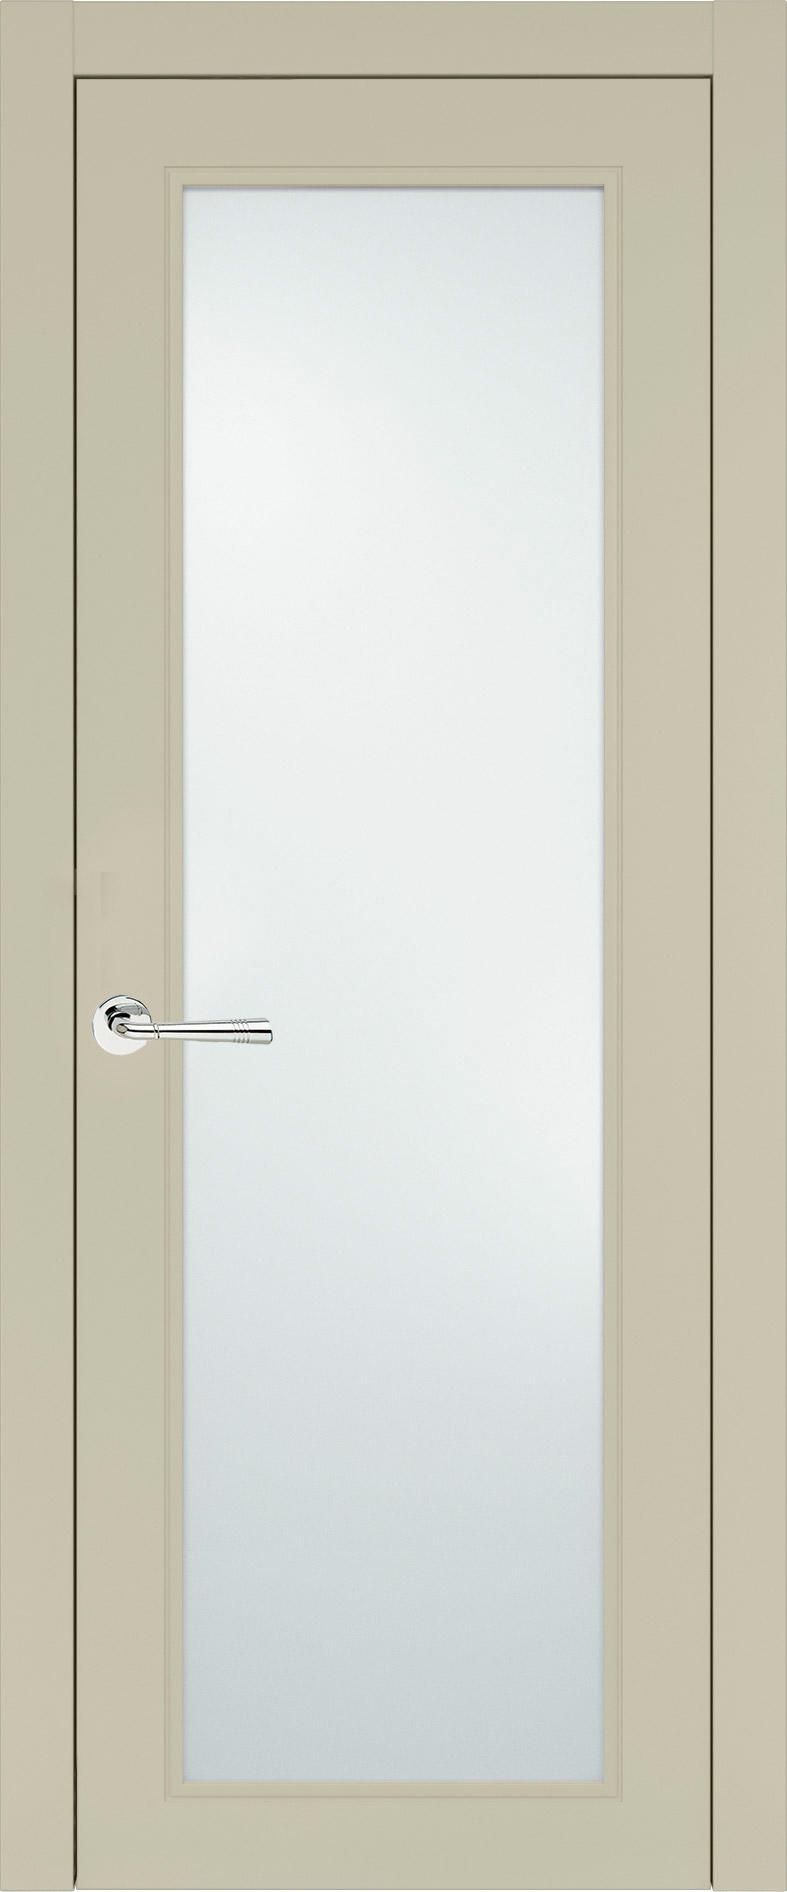 Domenica Neo Classic цвет - Серо-оливковая эмаль (RAL 7032) Со стеклом (ДО)